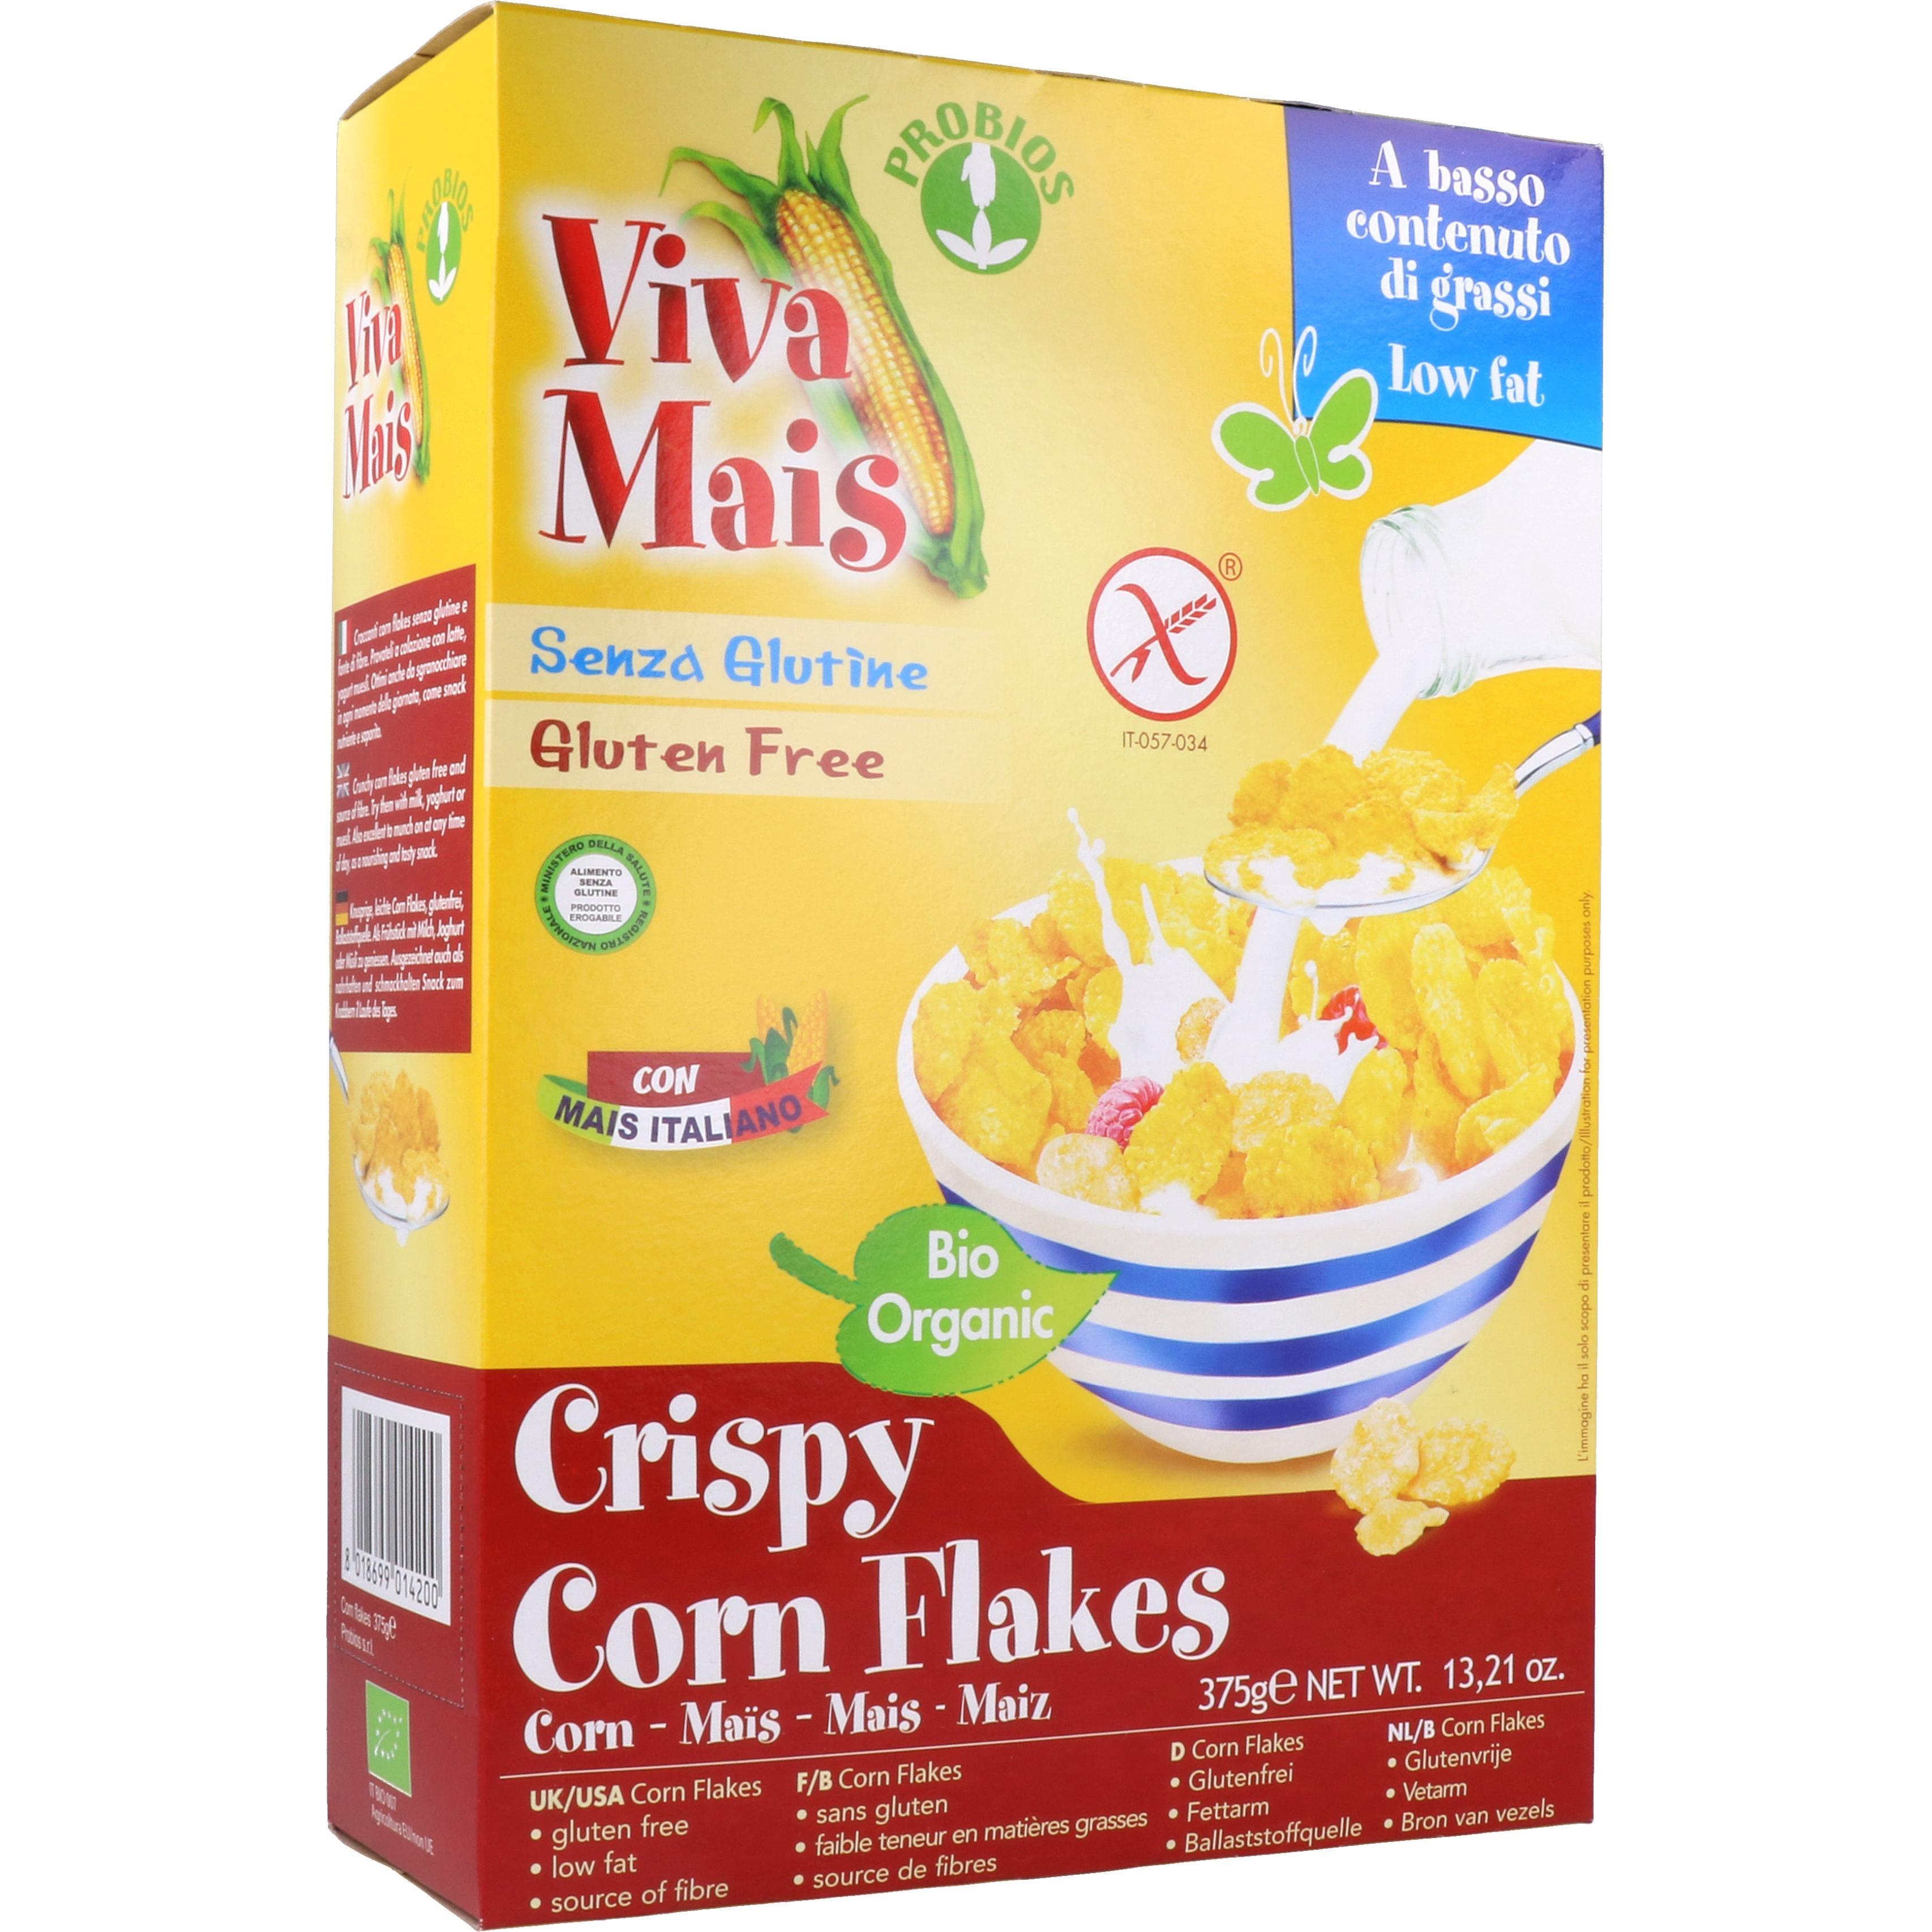 Probios Bio Crispy Corn Flakes 375g